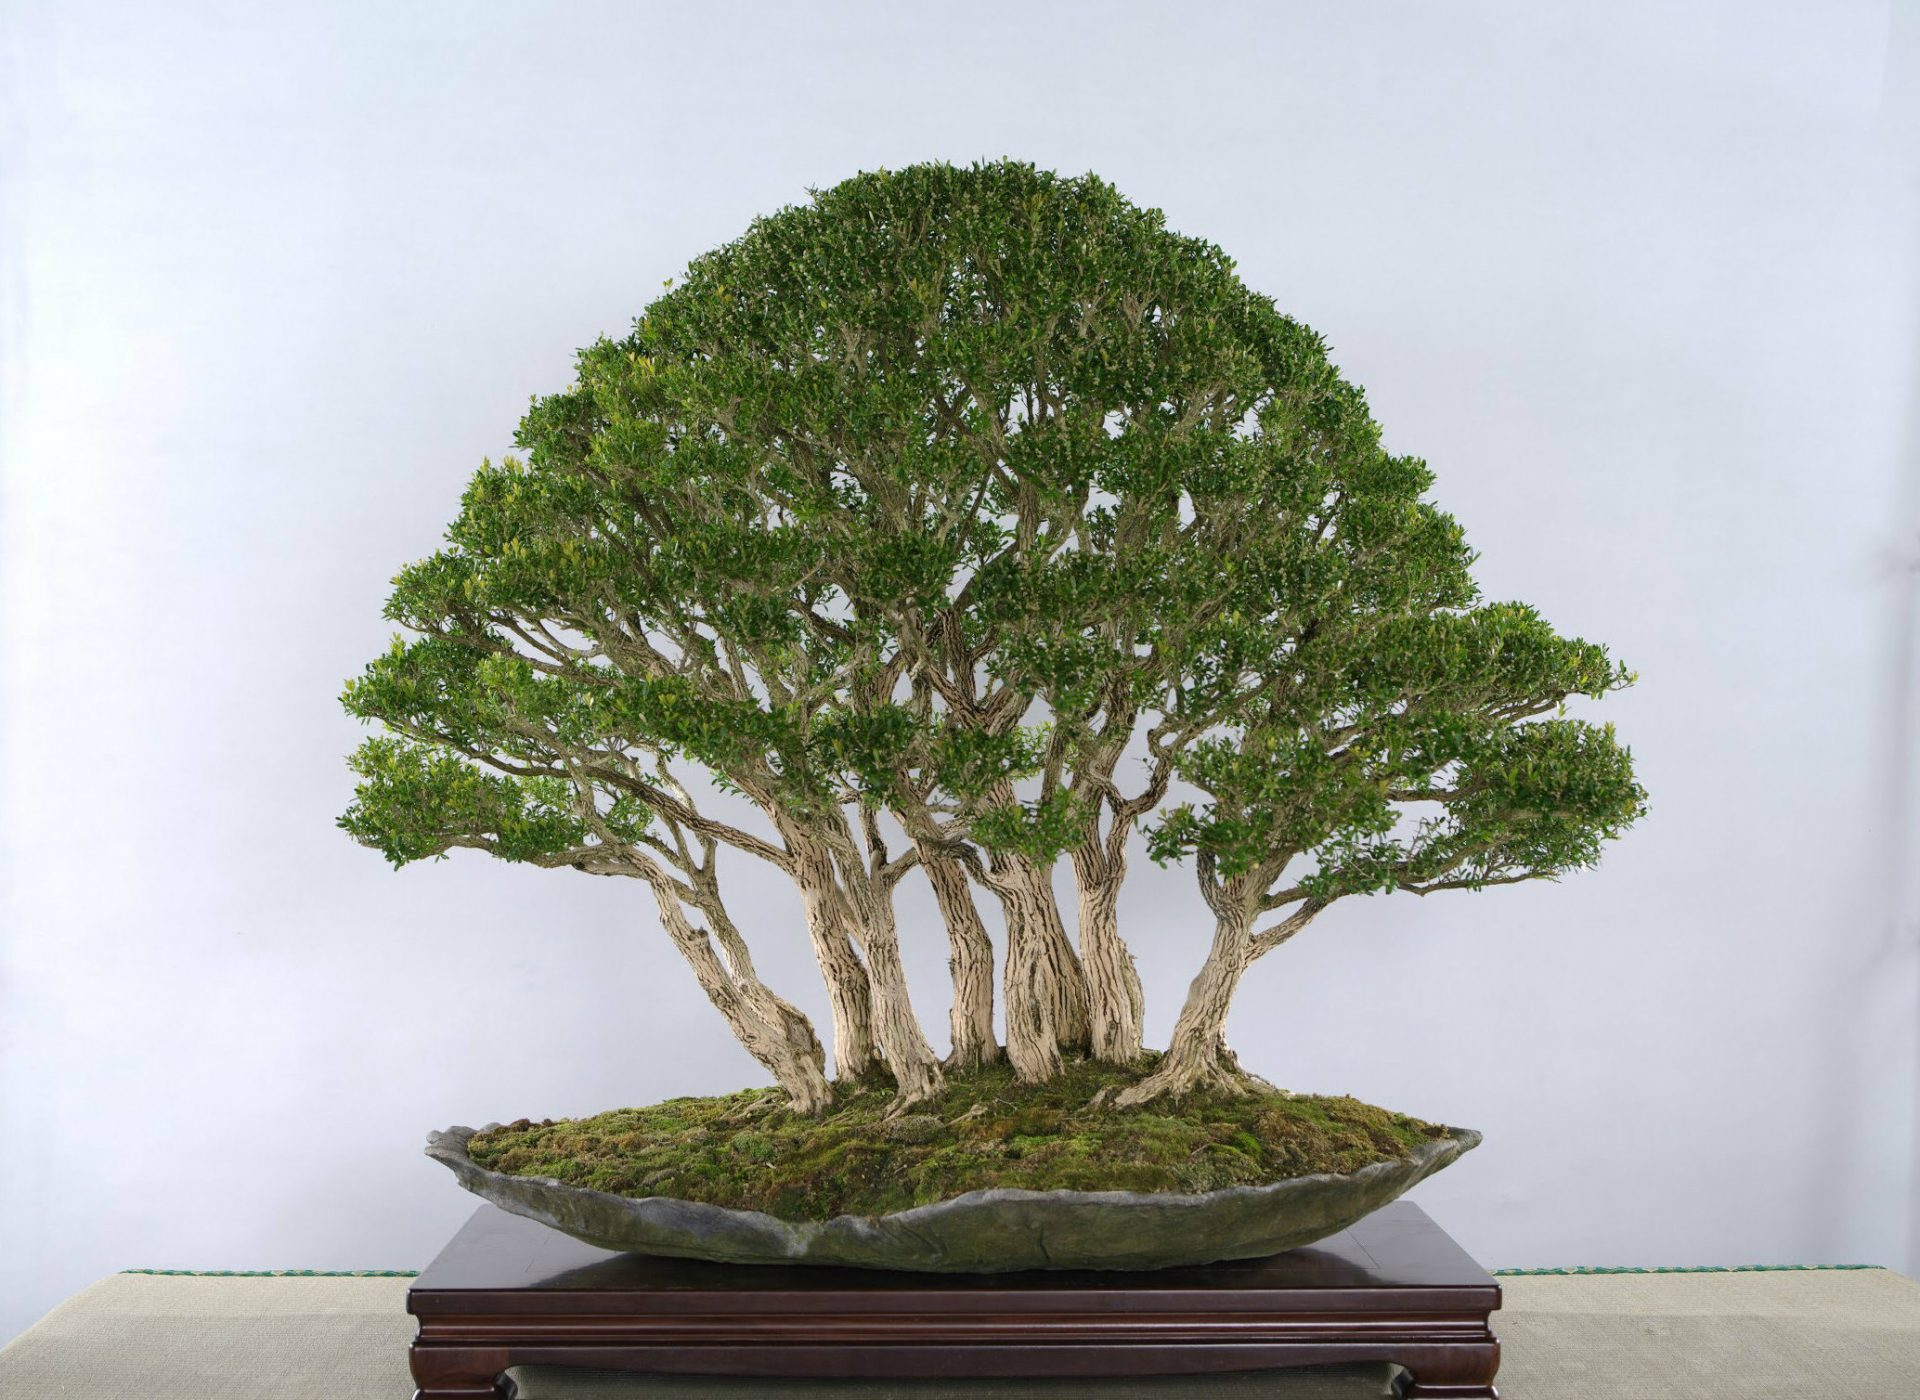 One of Professor Amy Liang's bonsai trees (Image: Courtesy of Jenny Zhang)